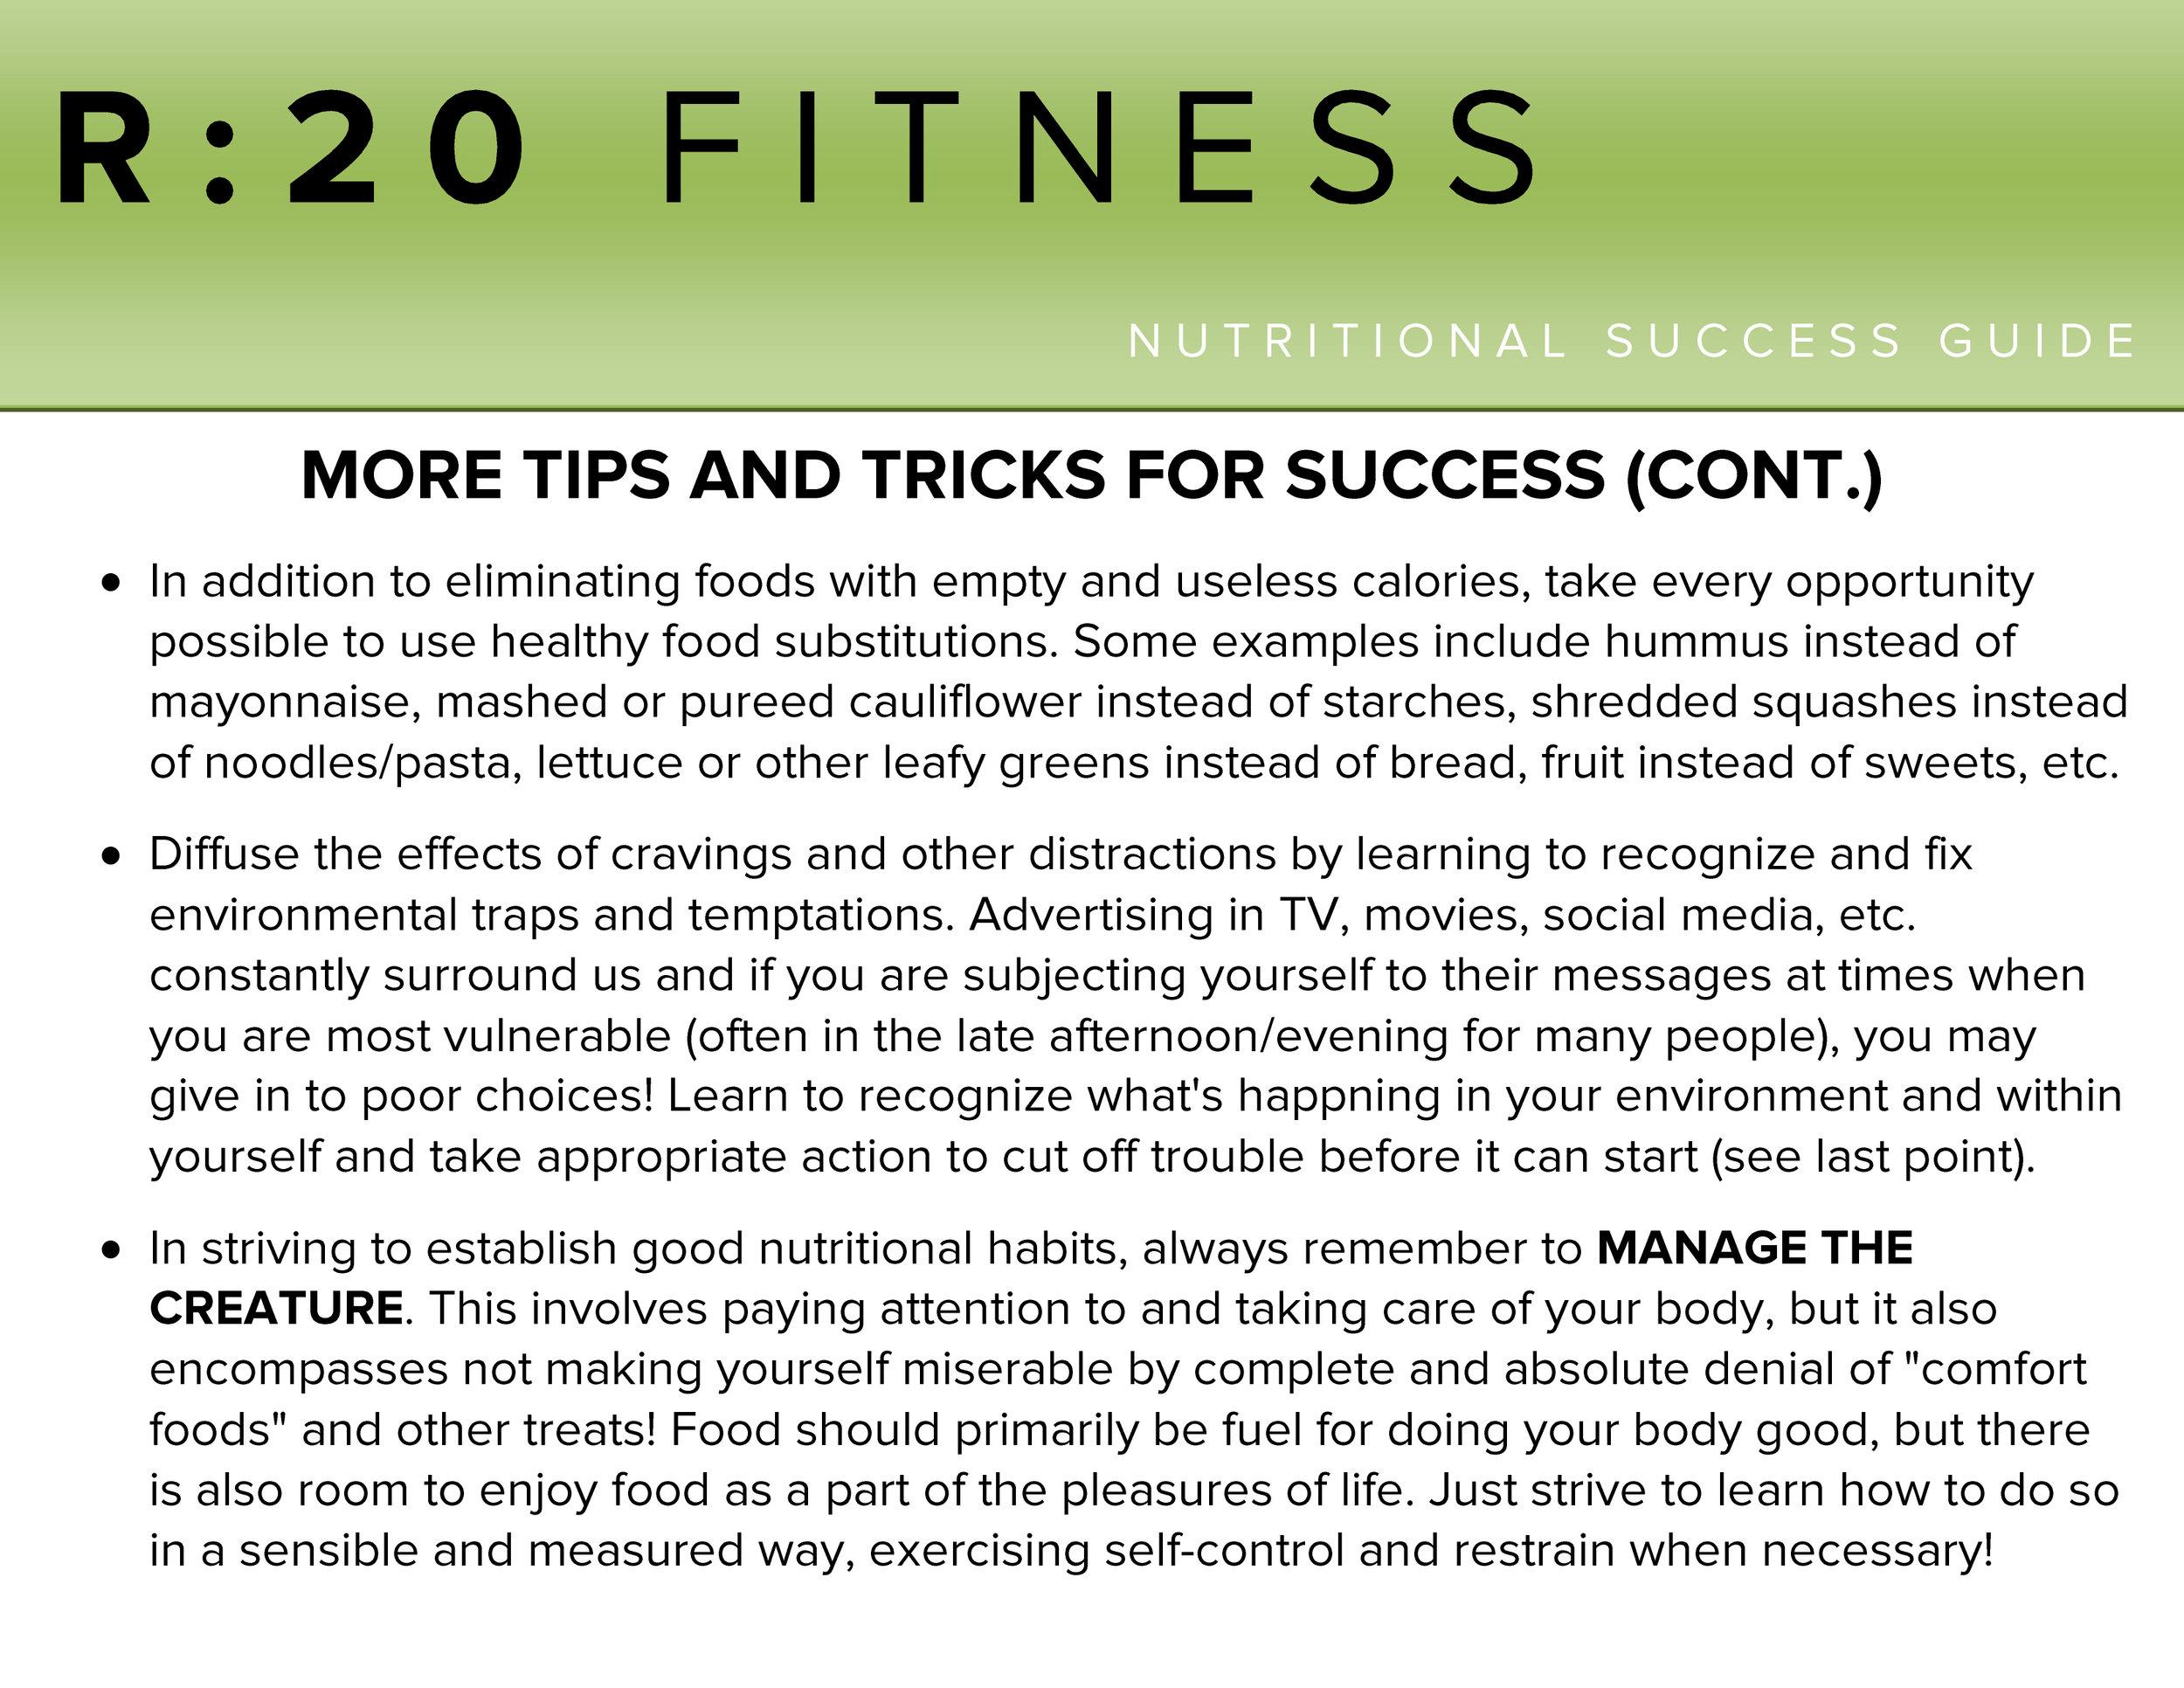 R20 1.0 Nutritional Success Guide-10.jpg